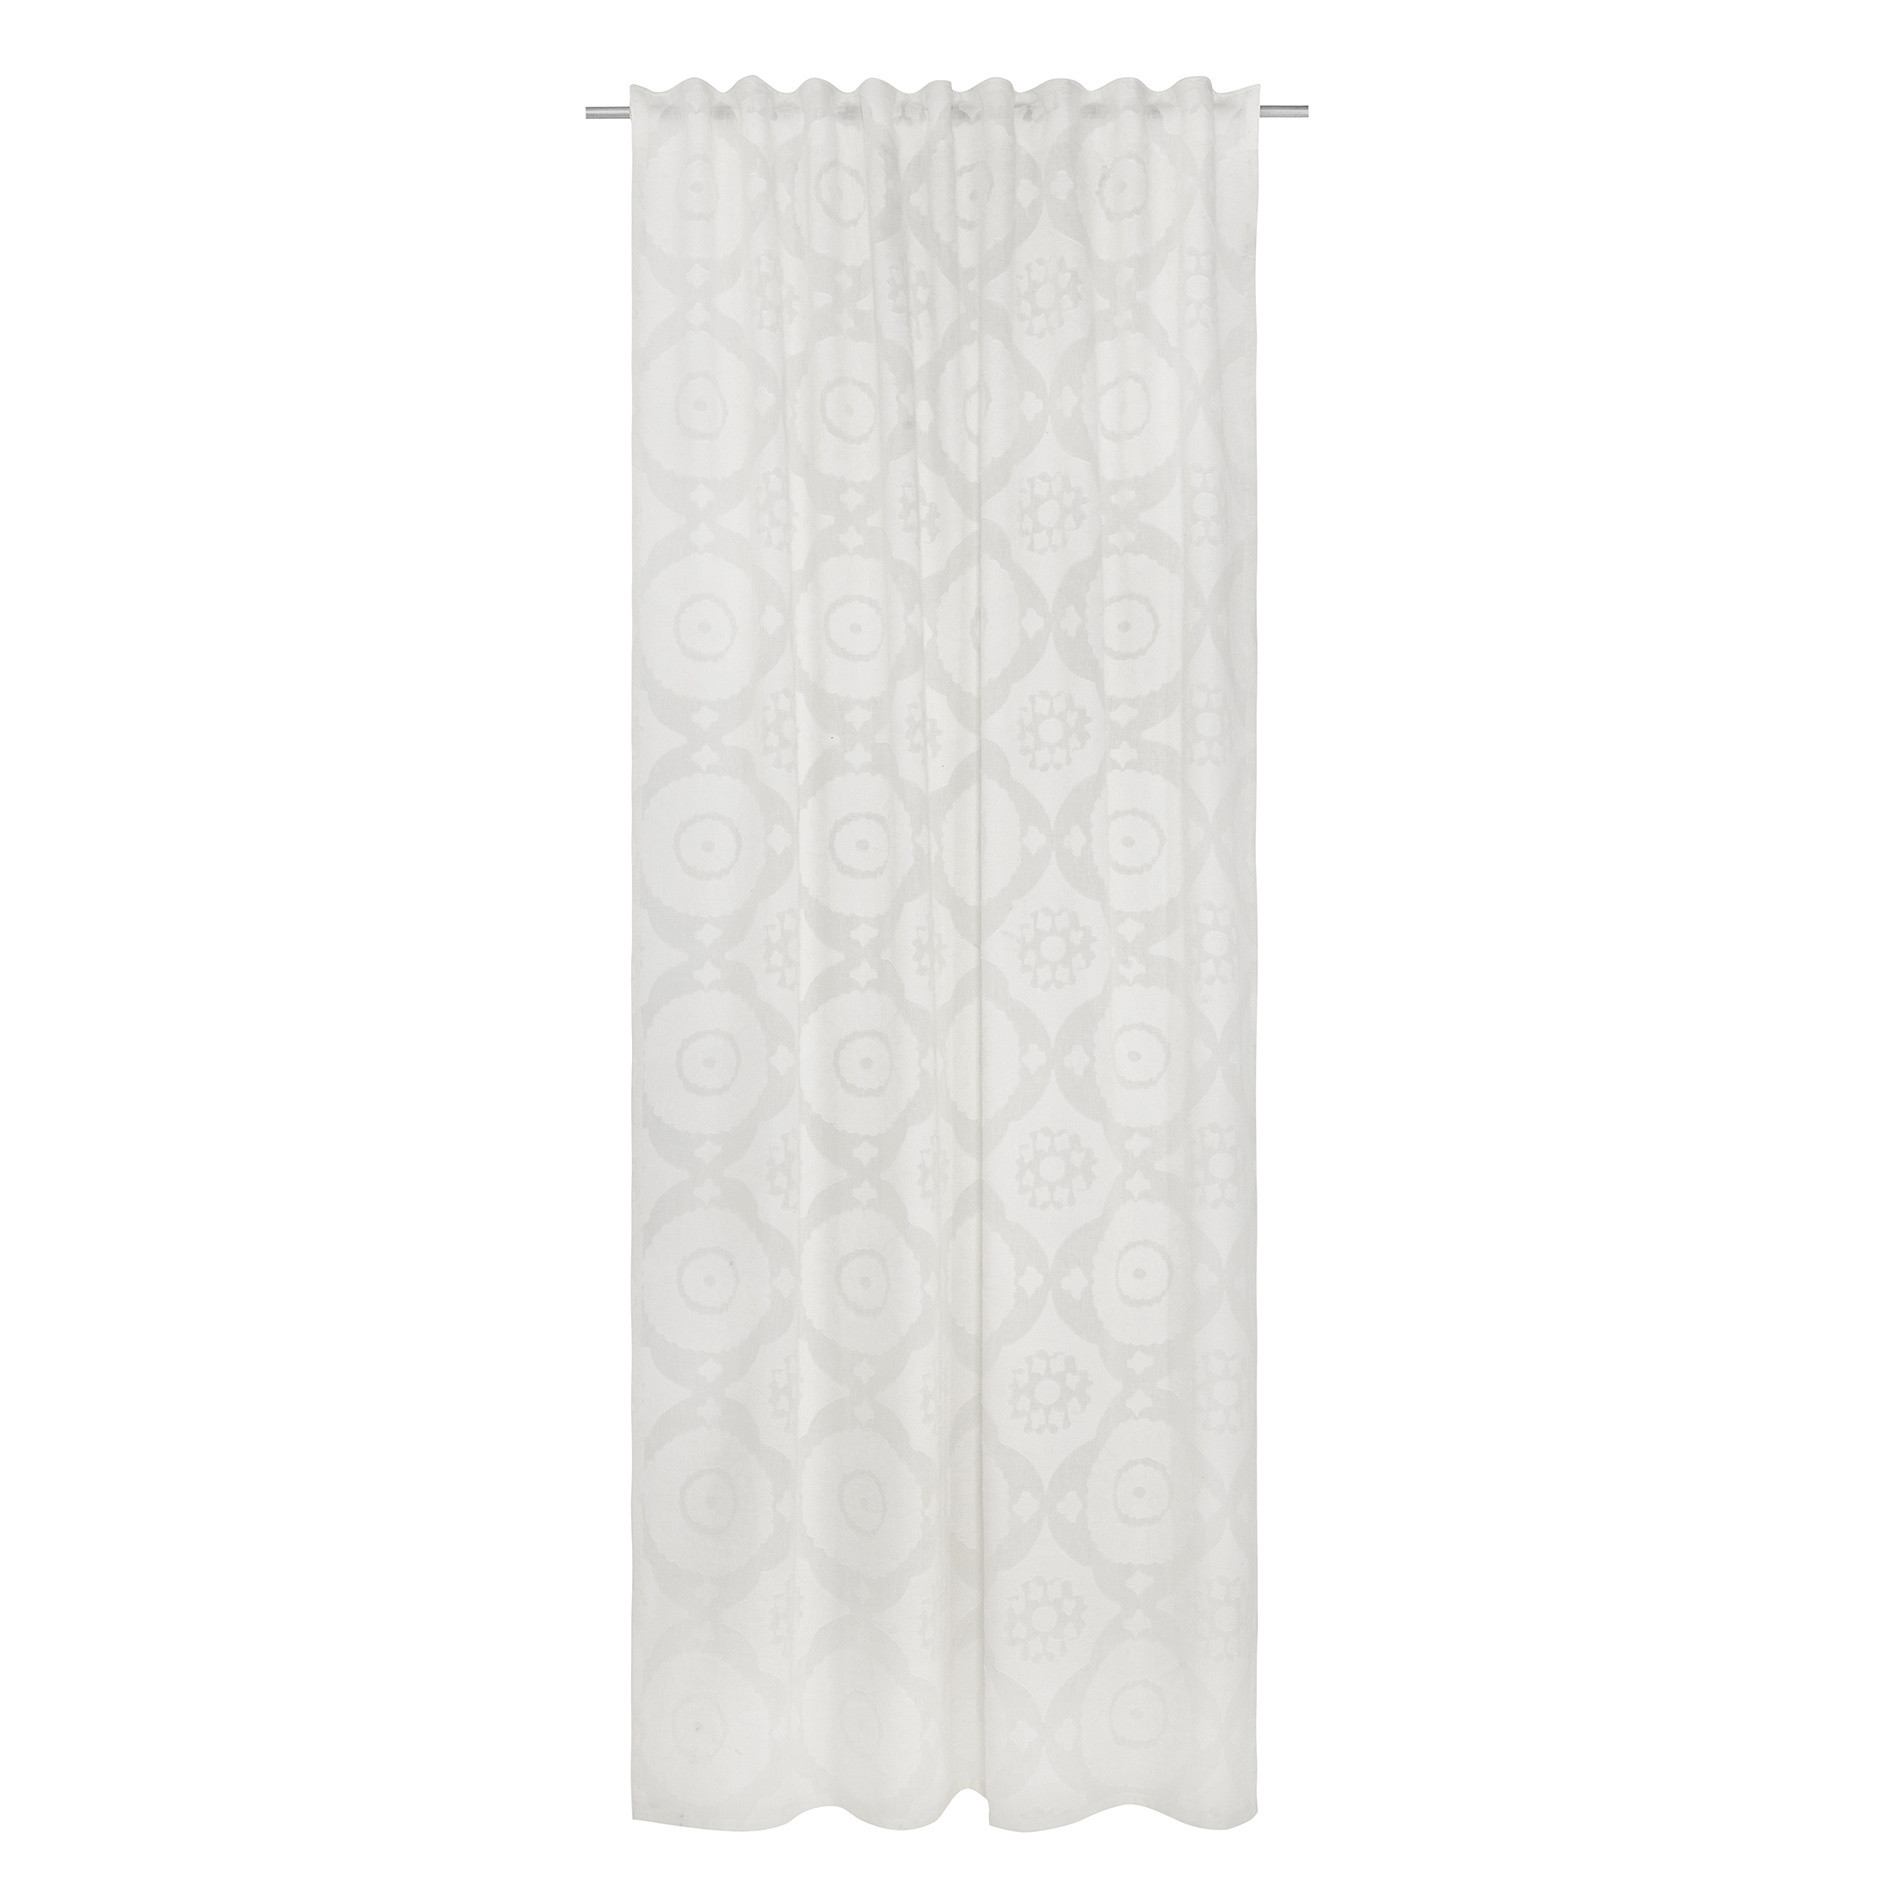 Tenda devore motivo geometrico passanti nascosti, Bianco, large image number 2